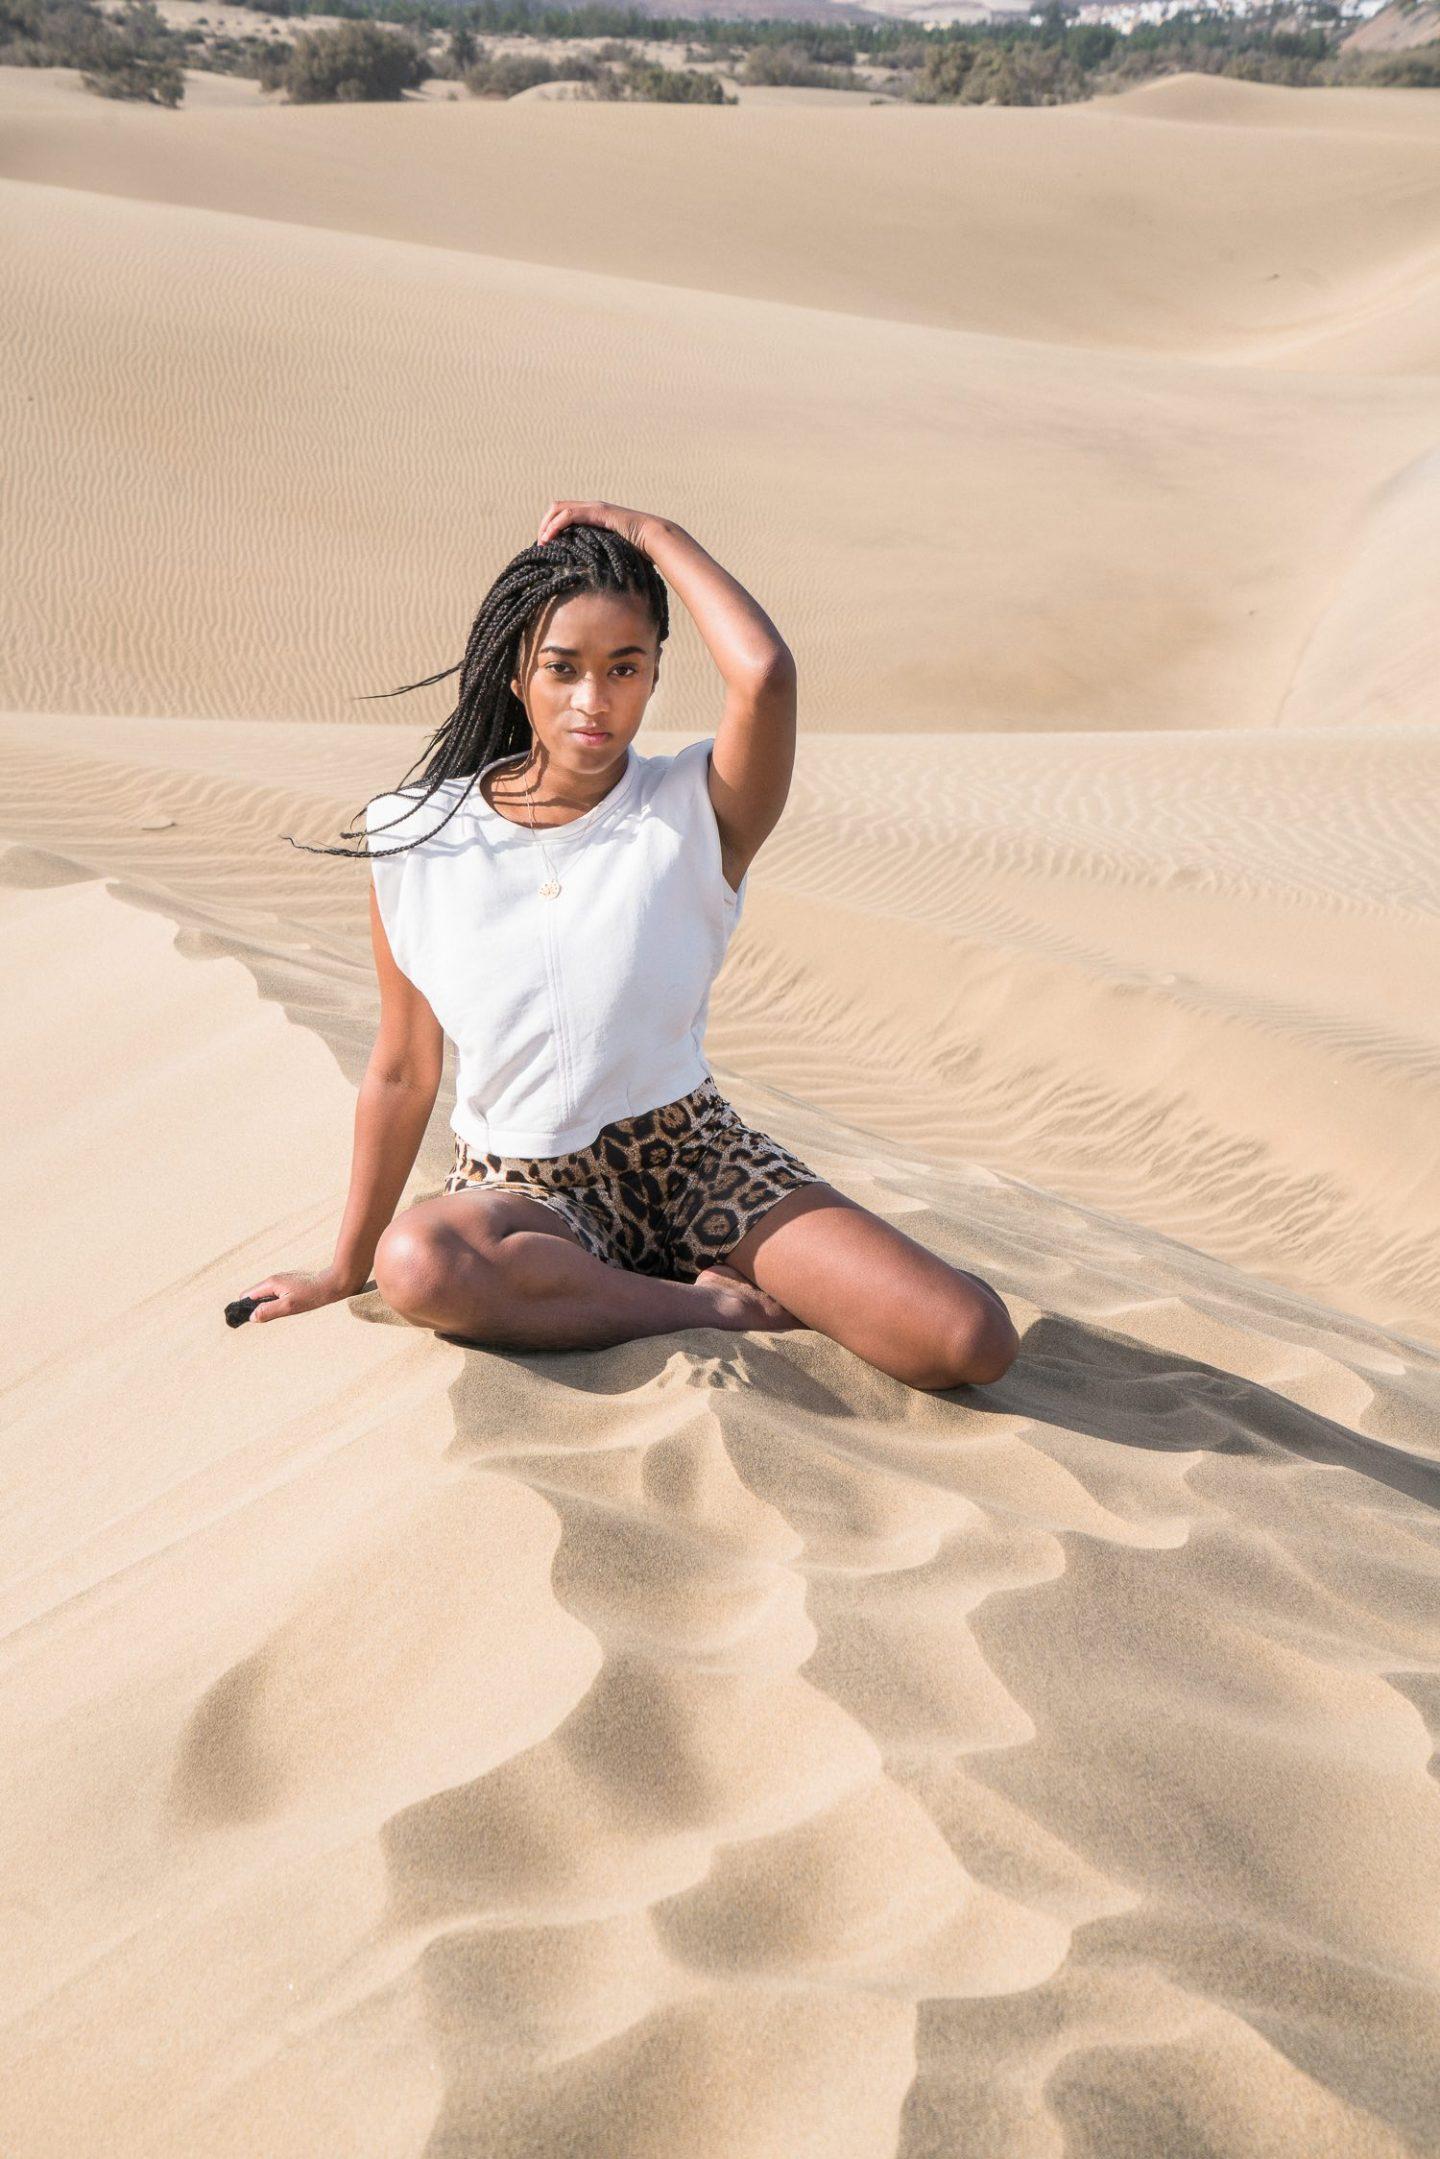 Sand dunes Photo Shooting